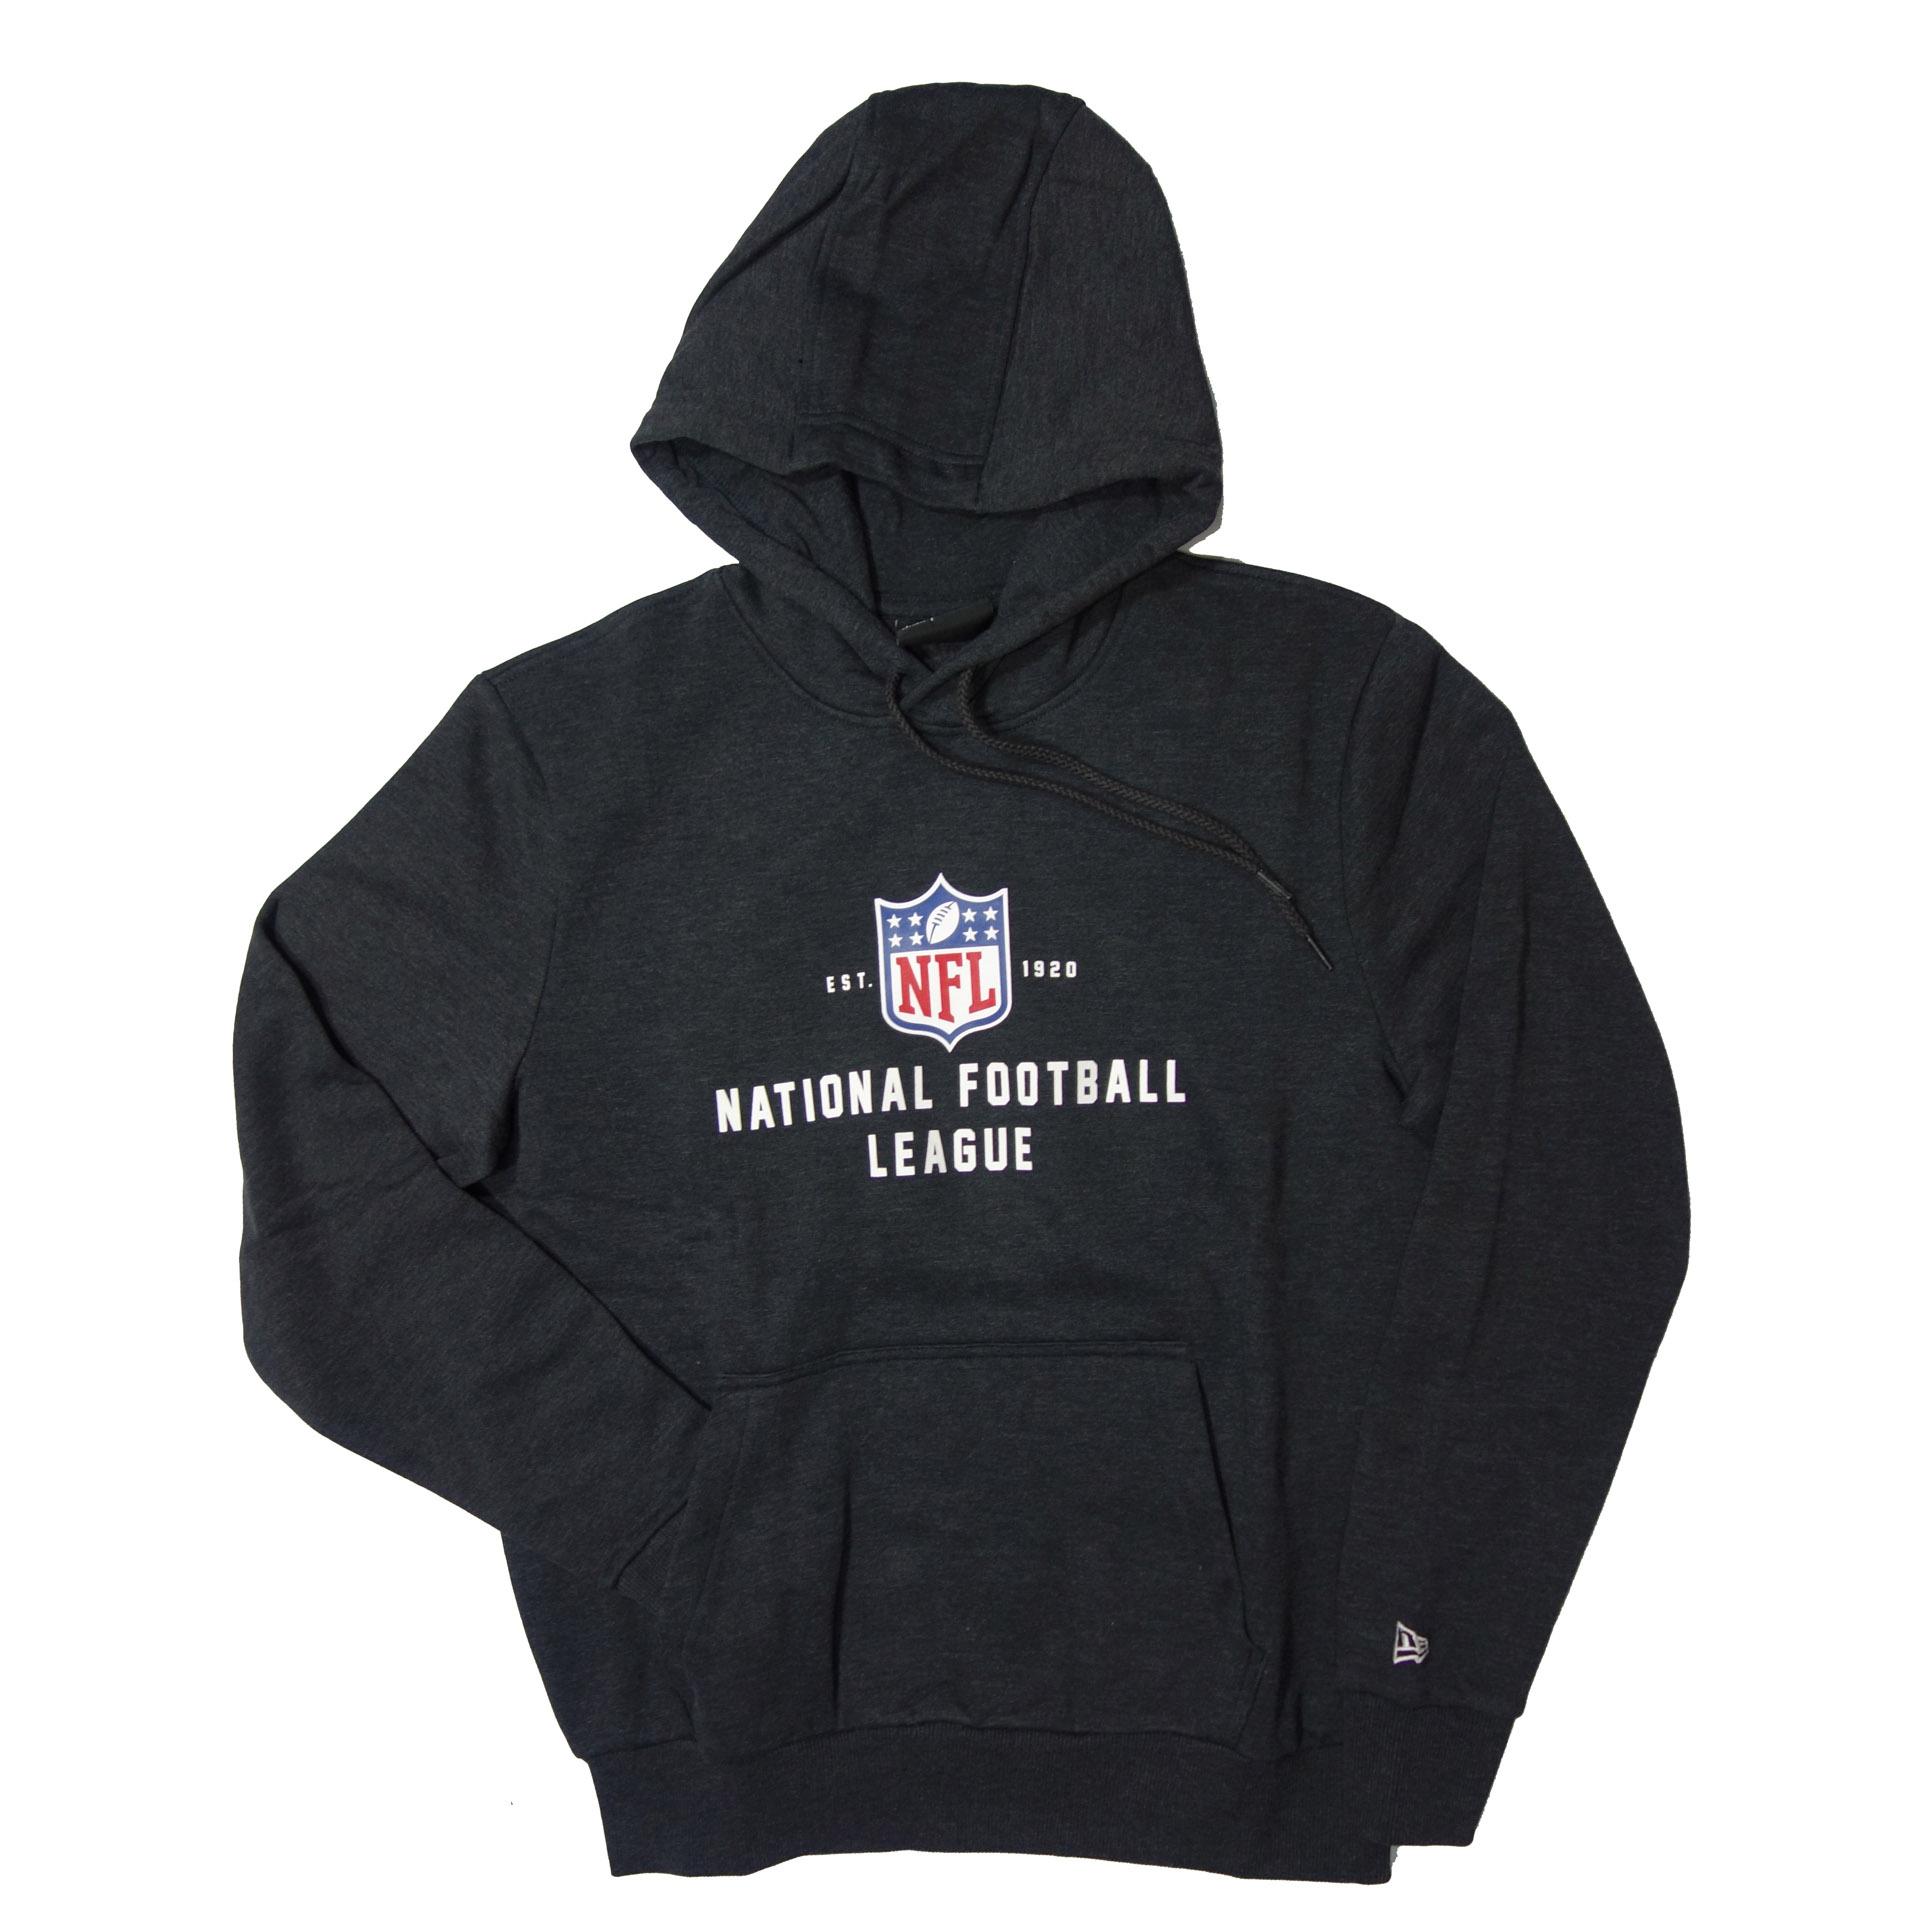 NFL Hoodie National Football League